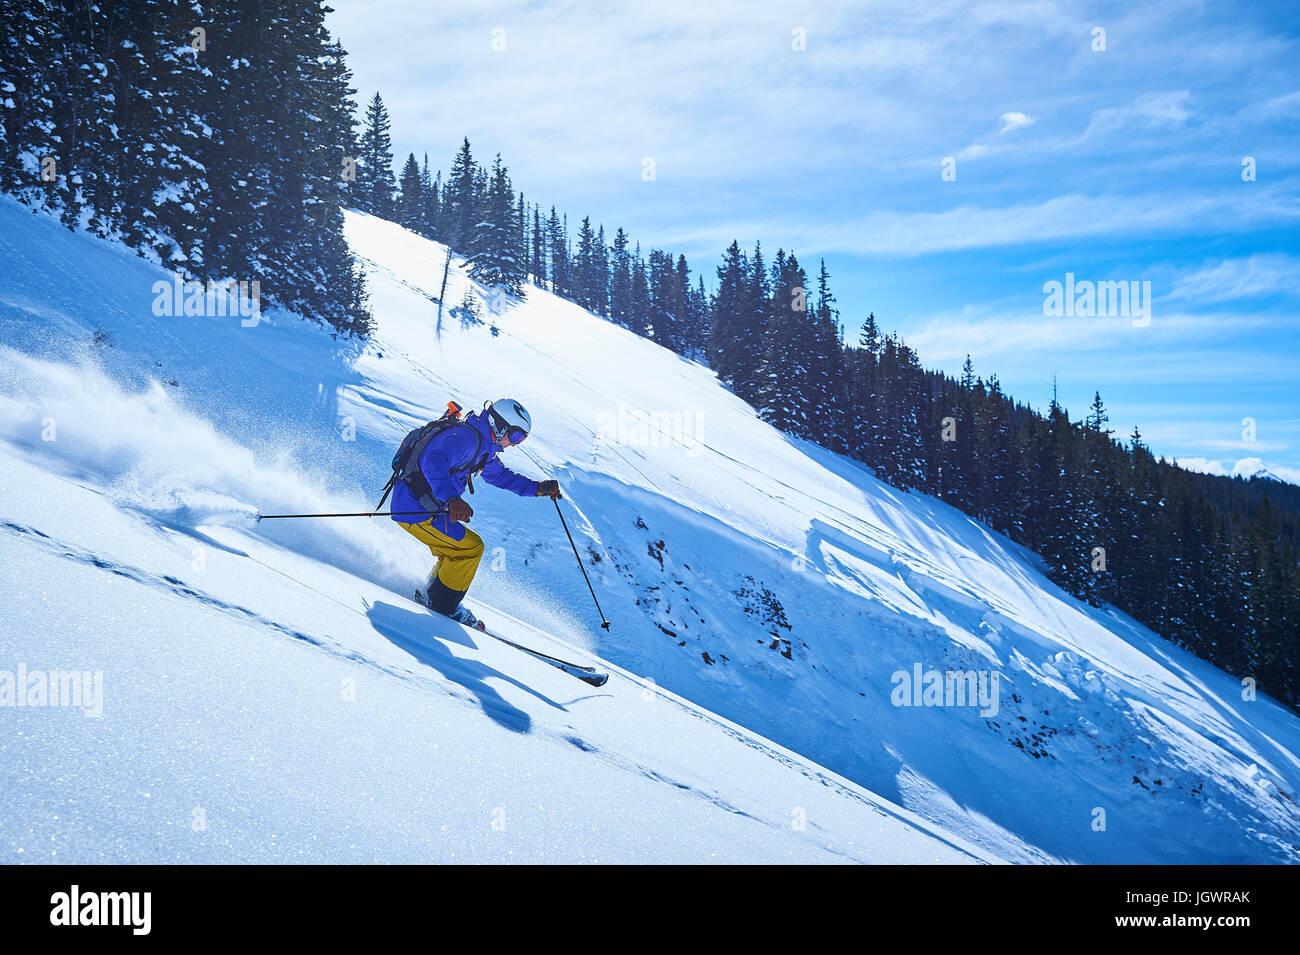 Man skiing down steep snow covered mountainside, Aspen, Colorado, USA - Stock Image